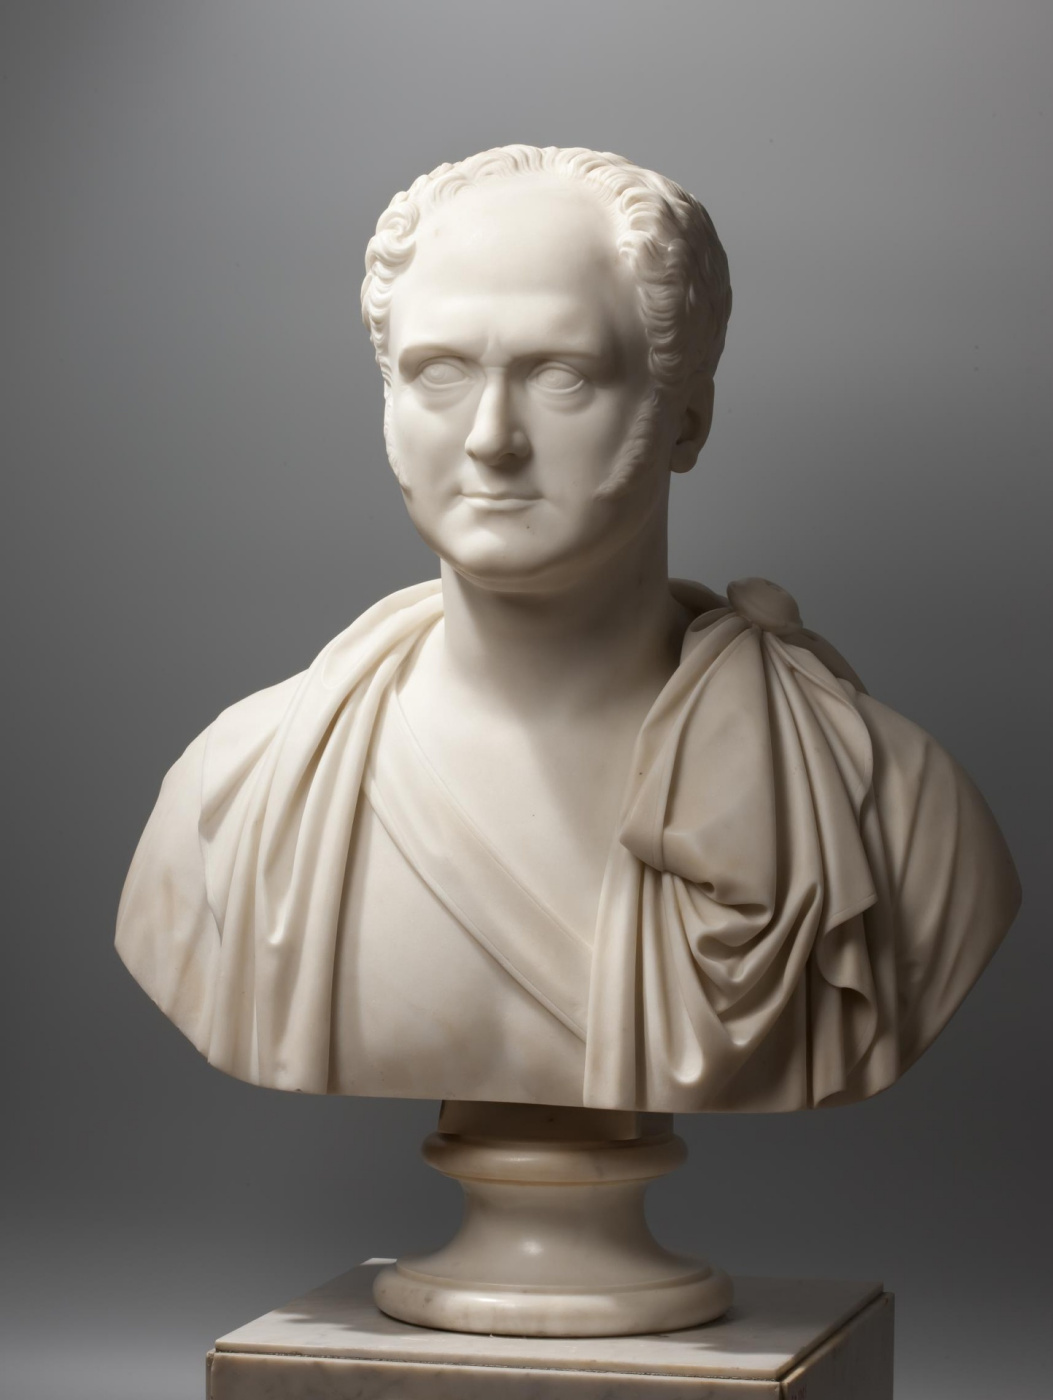 Bertel (Albert) Thorvaldsen. Портрет императора Александра I